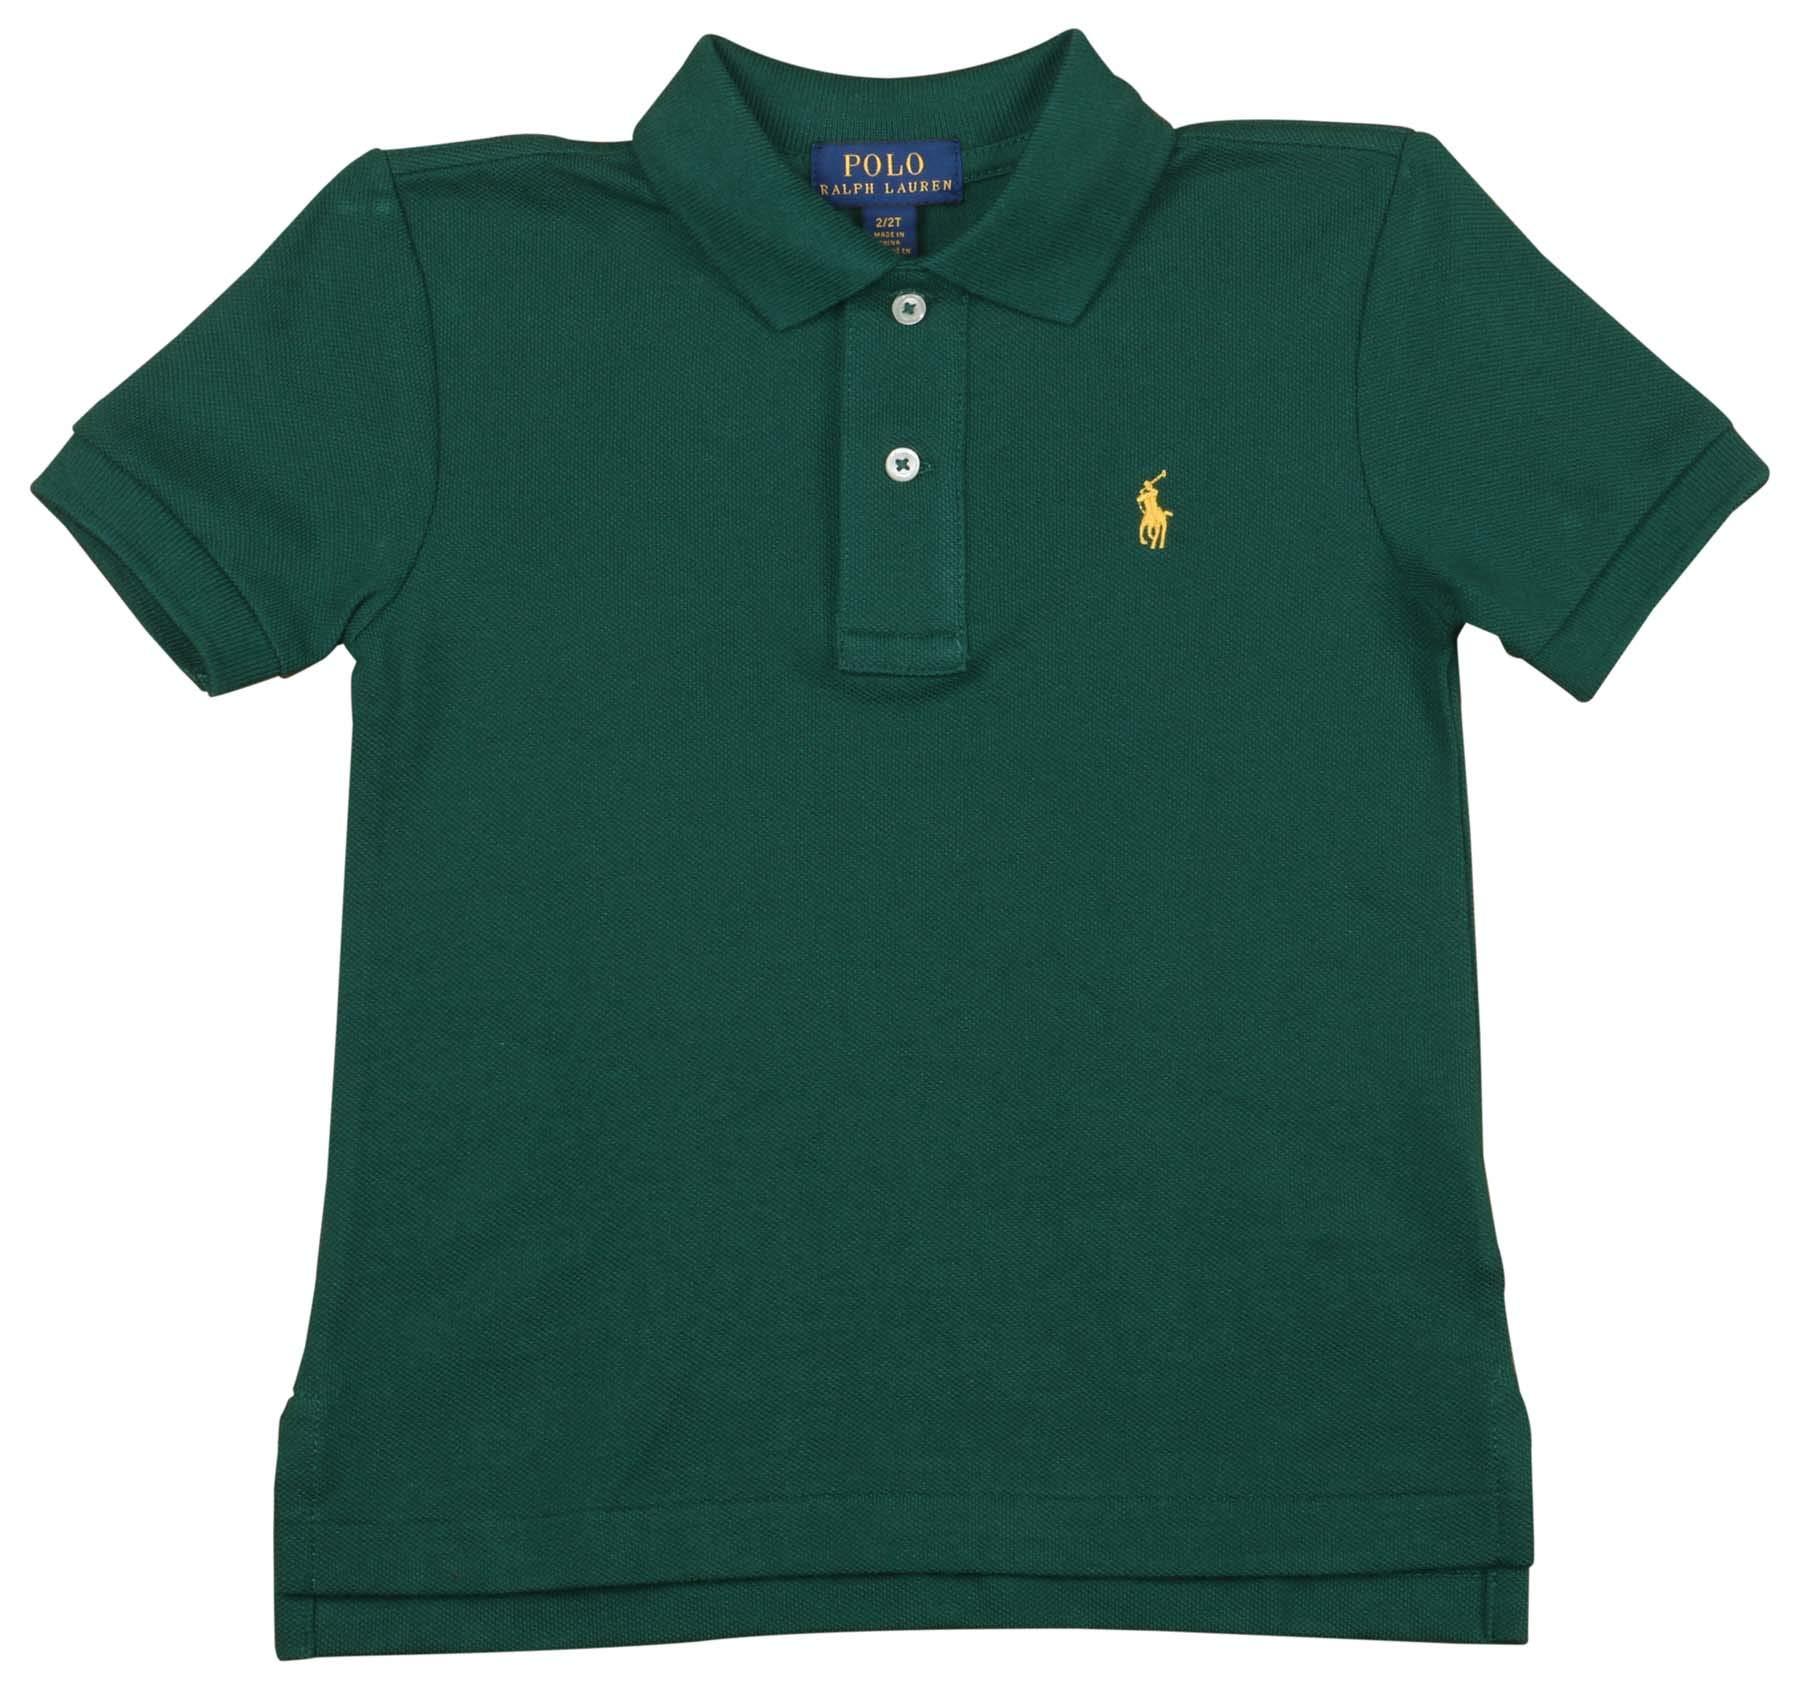 Polo RL Toddler Boy's (2T-5T) Mesh Polo Shirt-Pine Green-3T